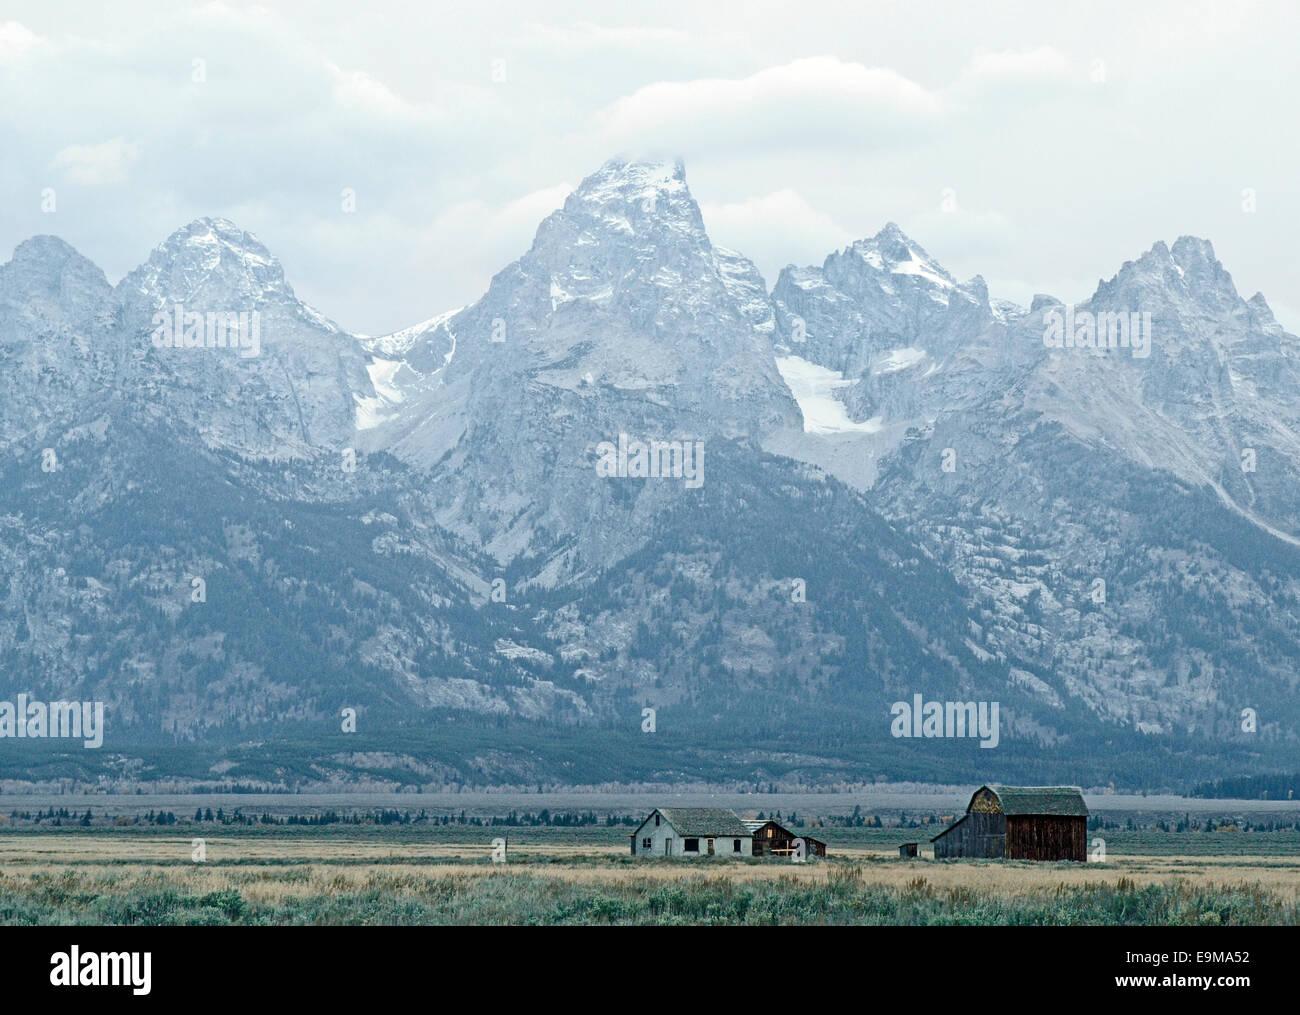 Grand Teton Mountains Towering Over Antelope Flats - Stock Image